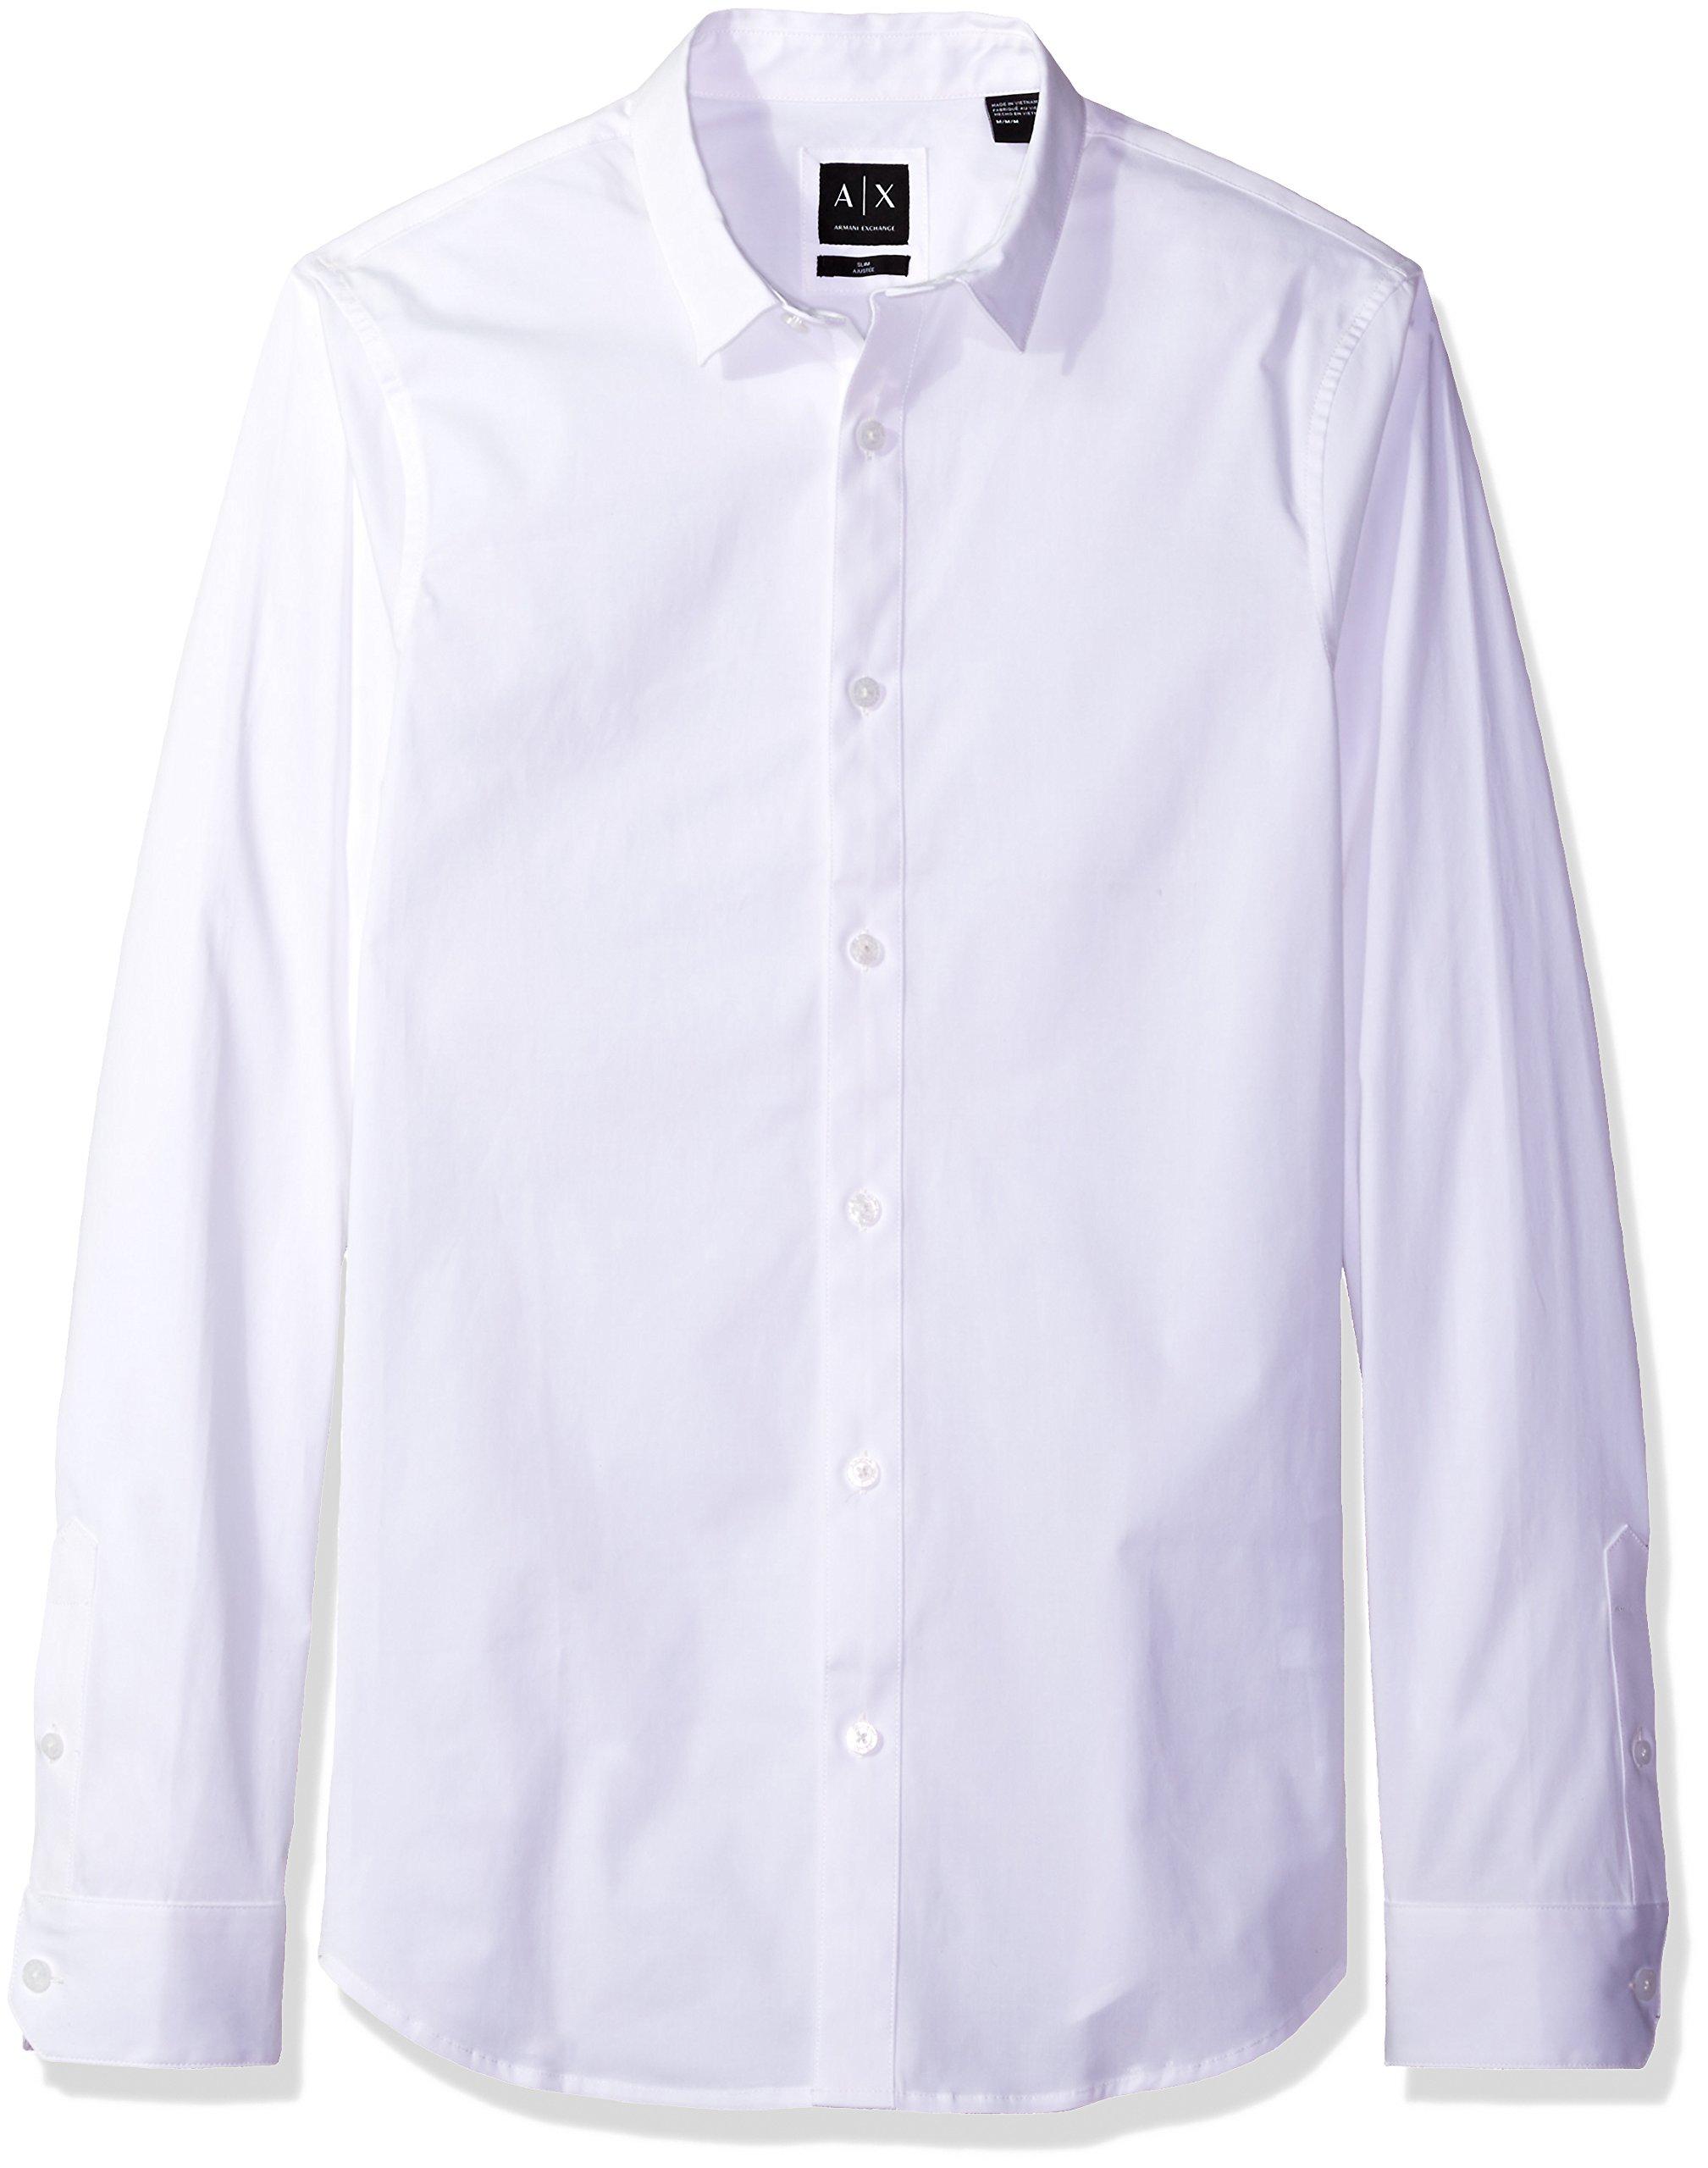 A X Armani Exchange Men's Stretch Poplin Long Sleeve Collared Woven Slim Fit, Optic White, Medium